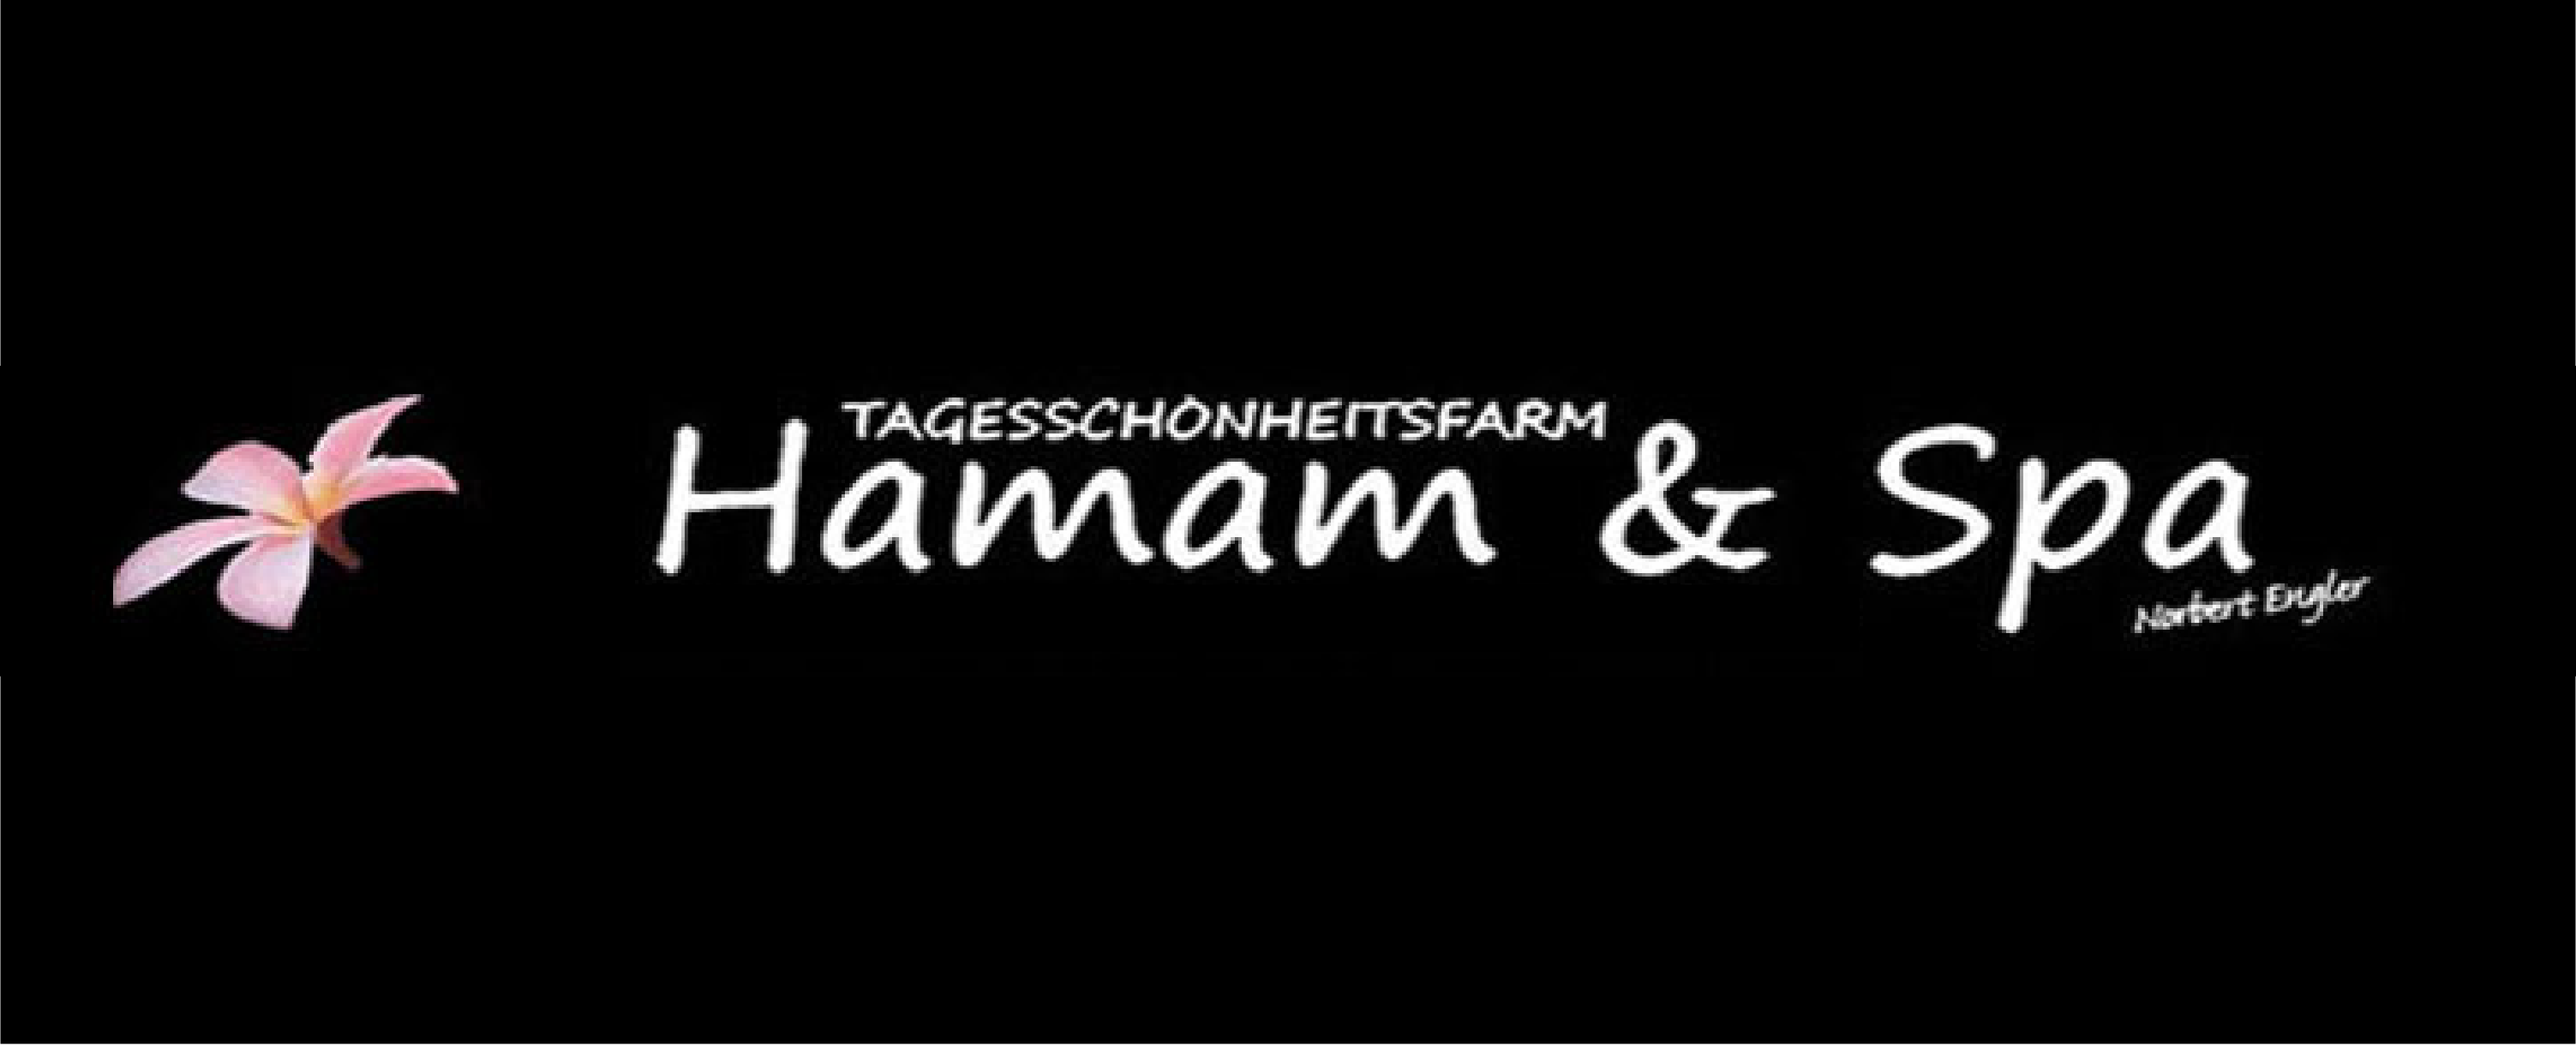 Hamam & Spa Tagesschönheitsfarm